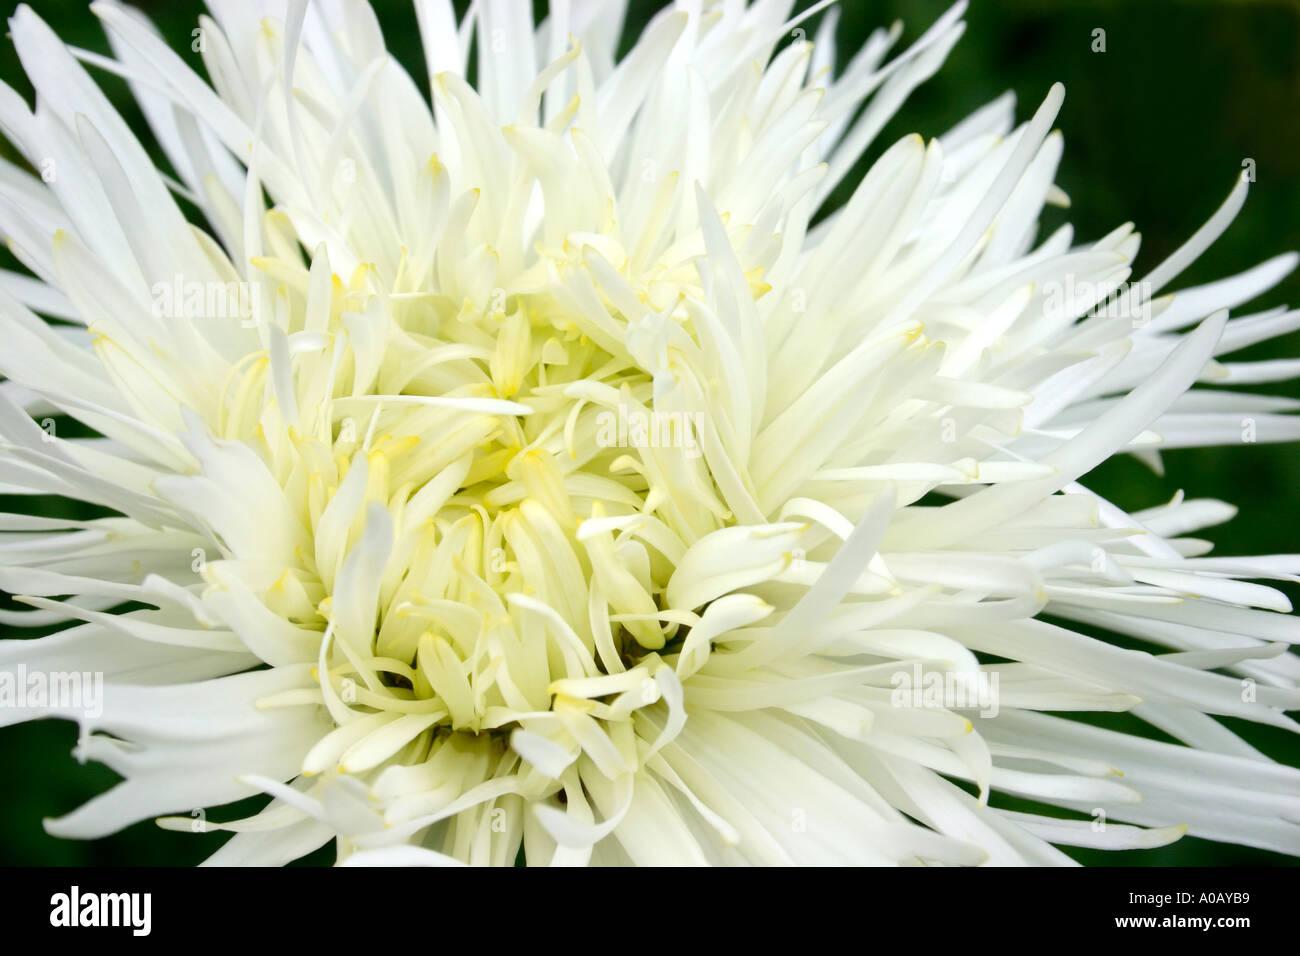 White flower of garden plant Leucanthemum x superbum Shaggy Common